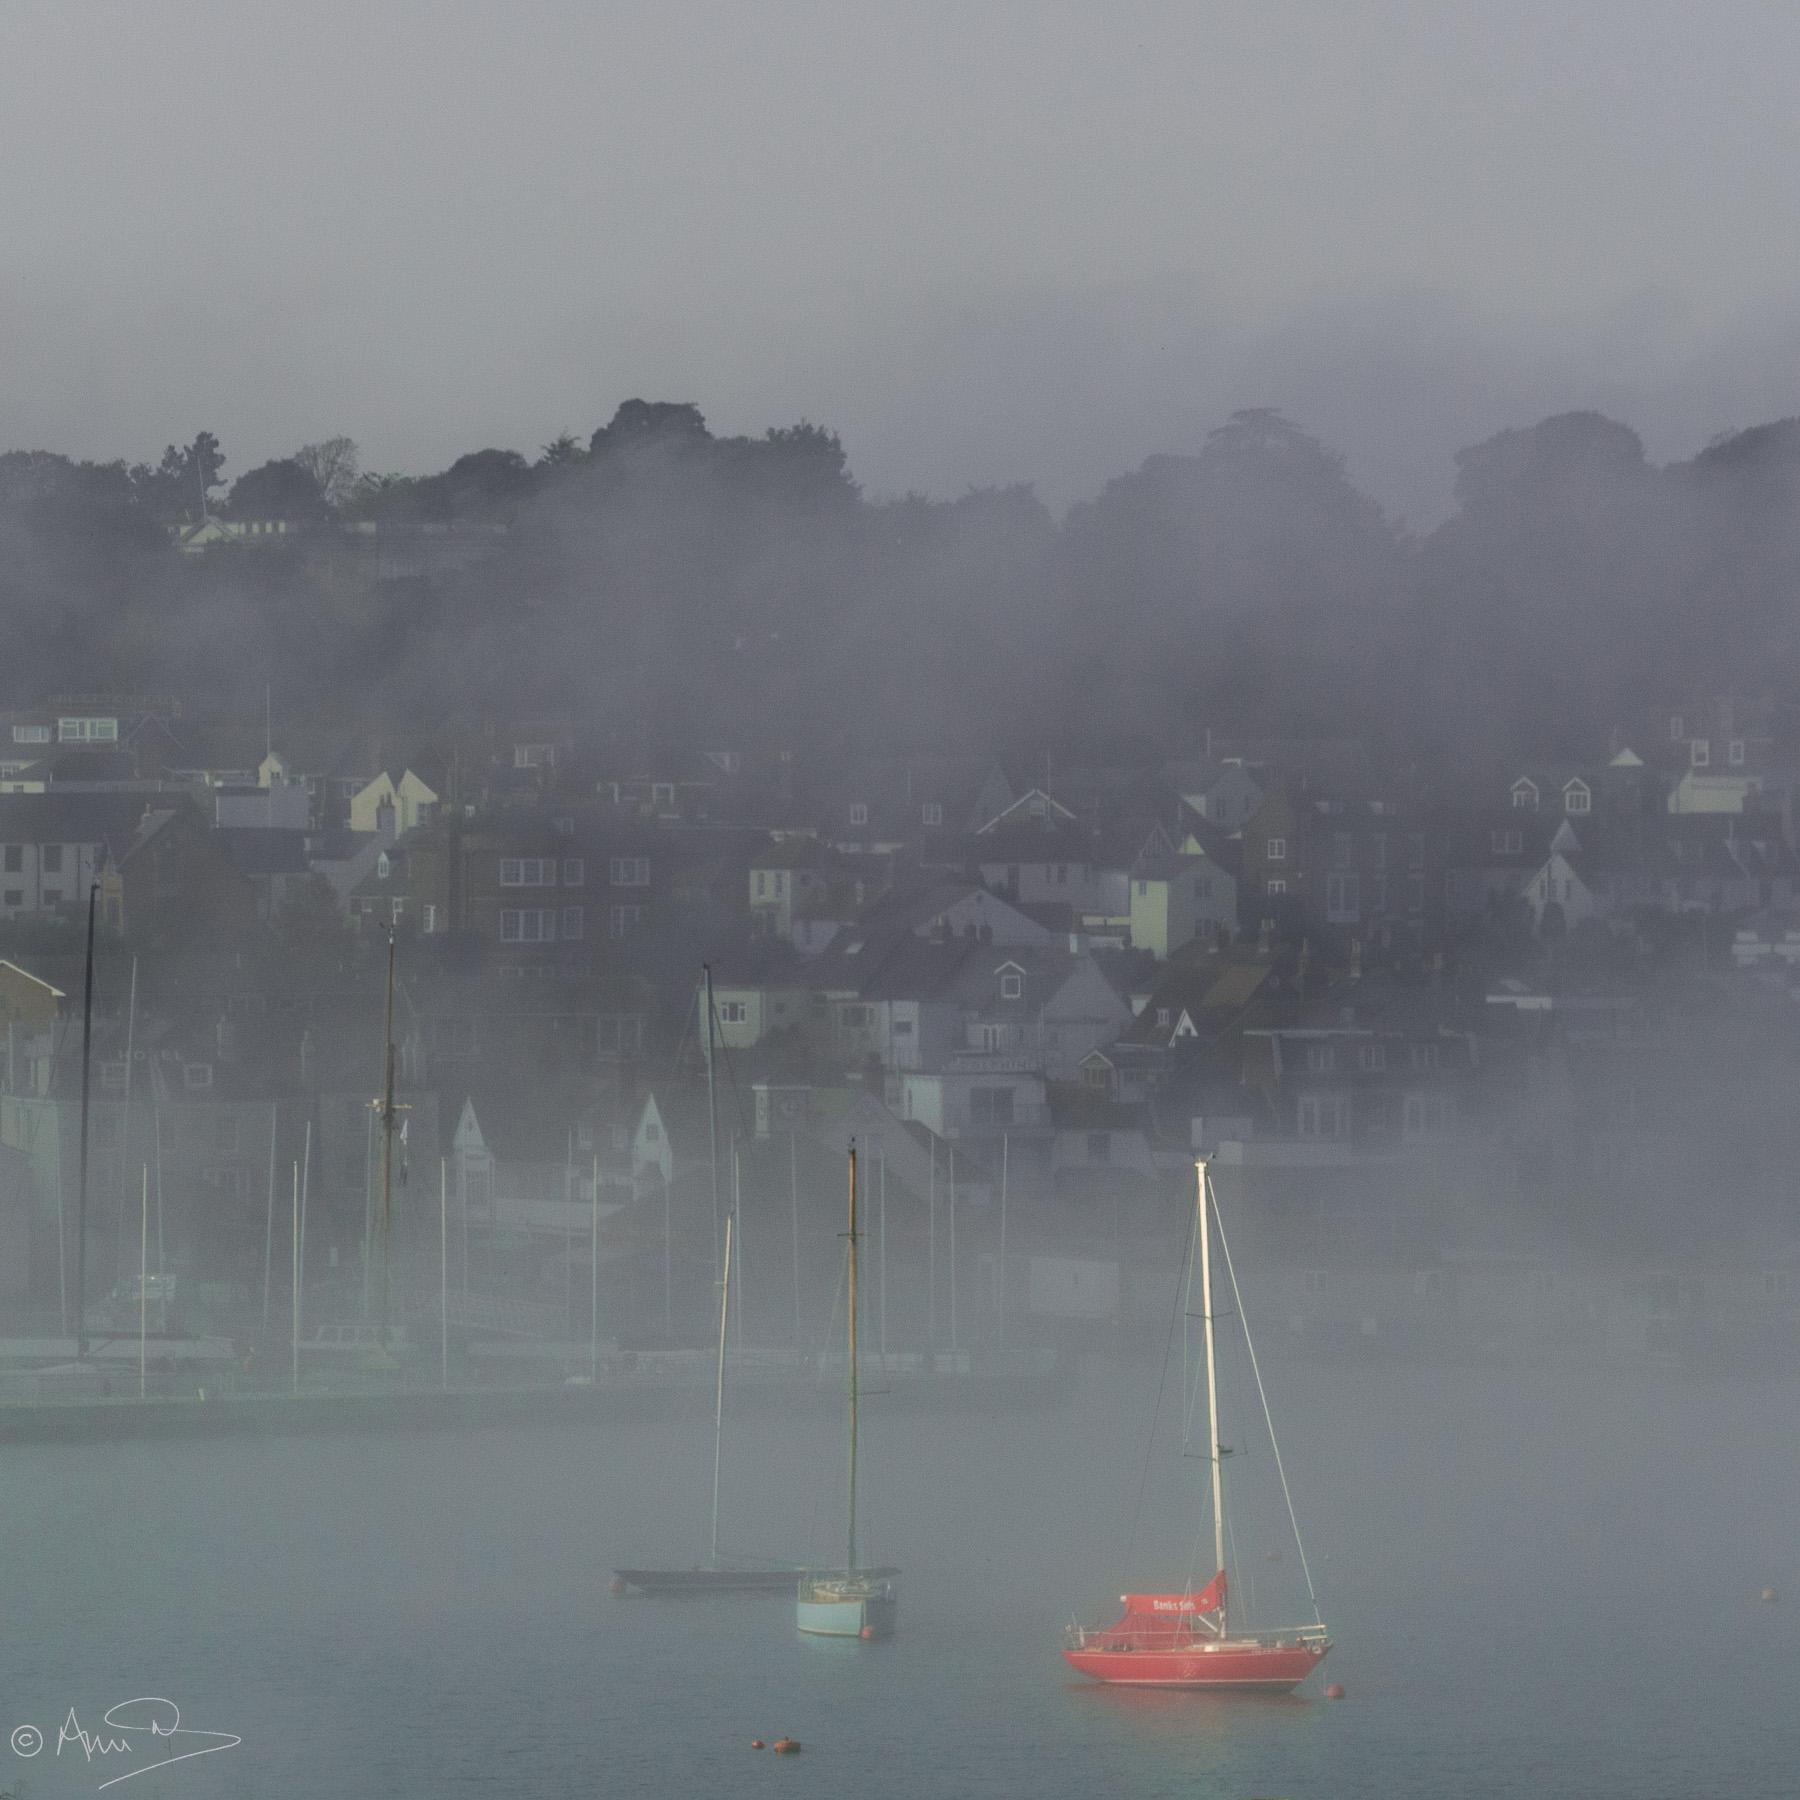 red boat in mist